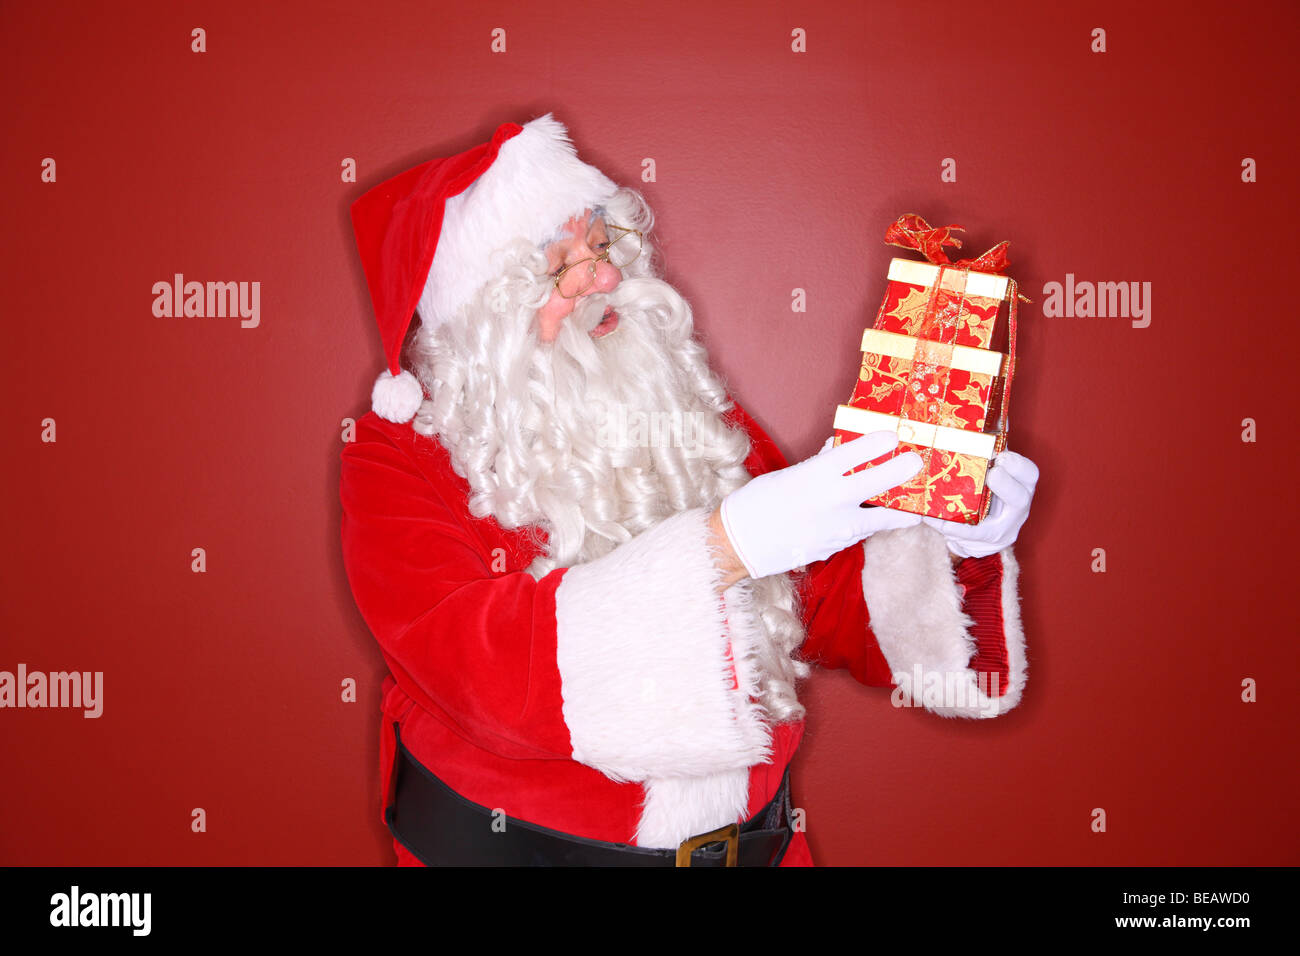 Santa holding present - Stock Image